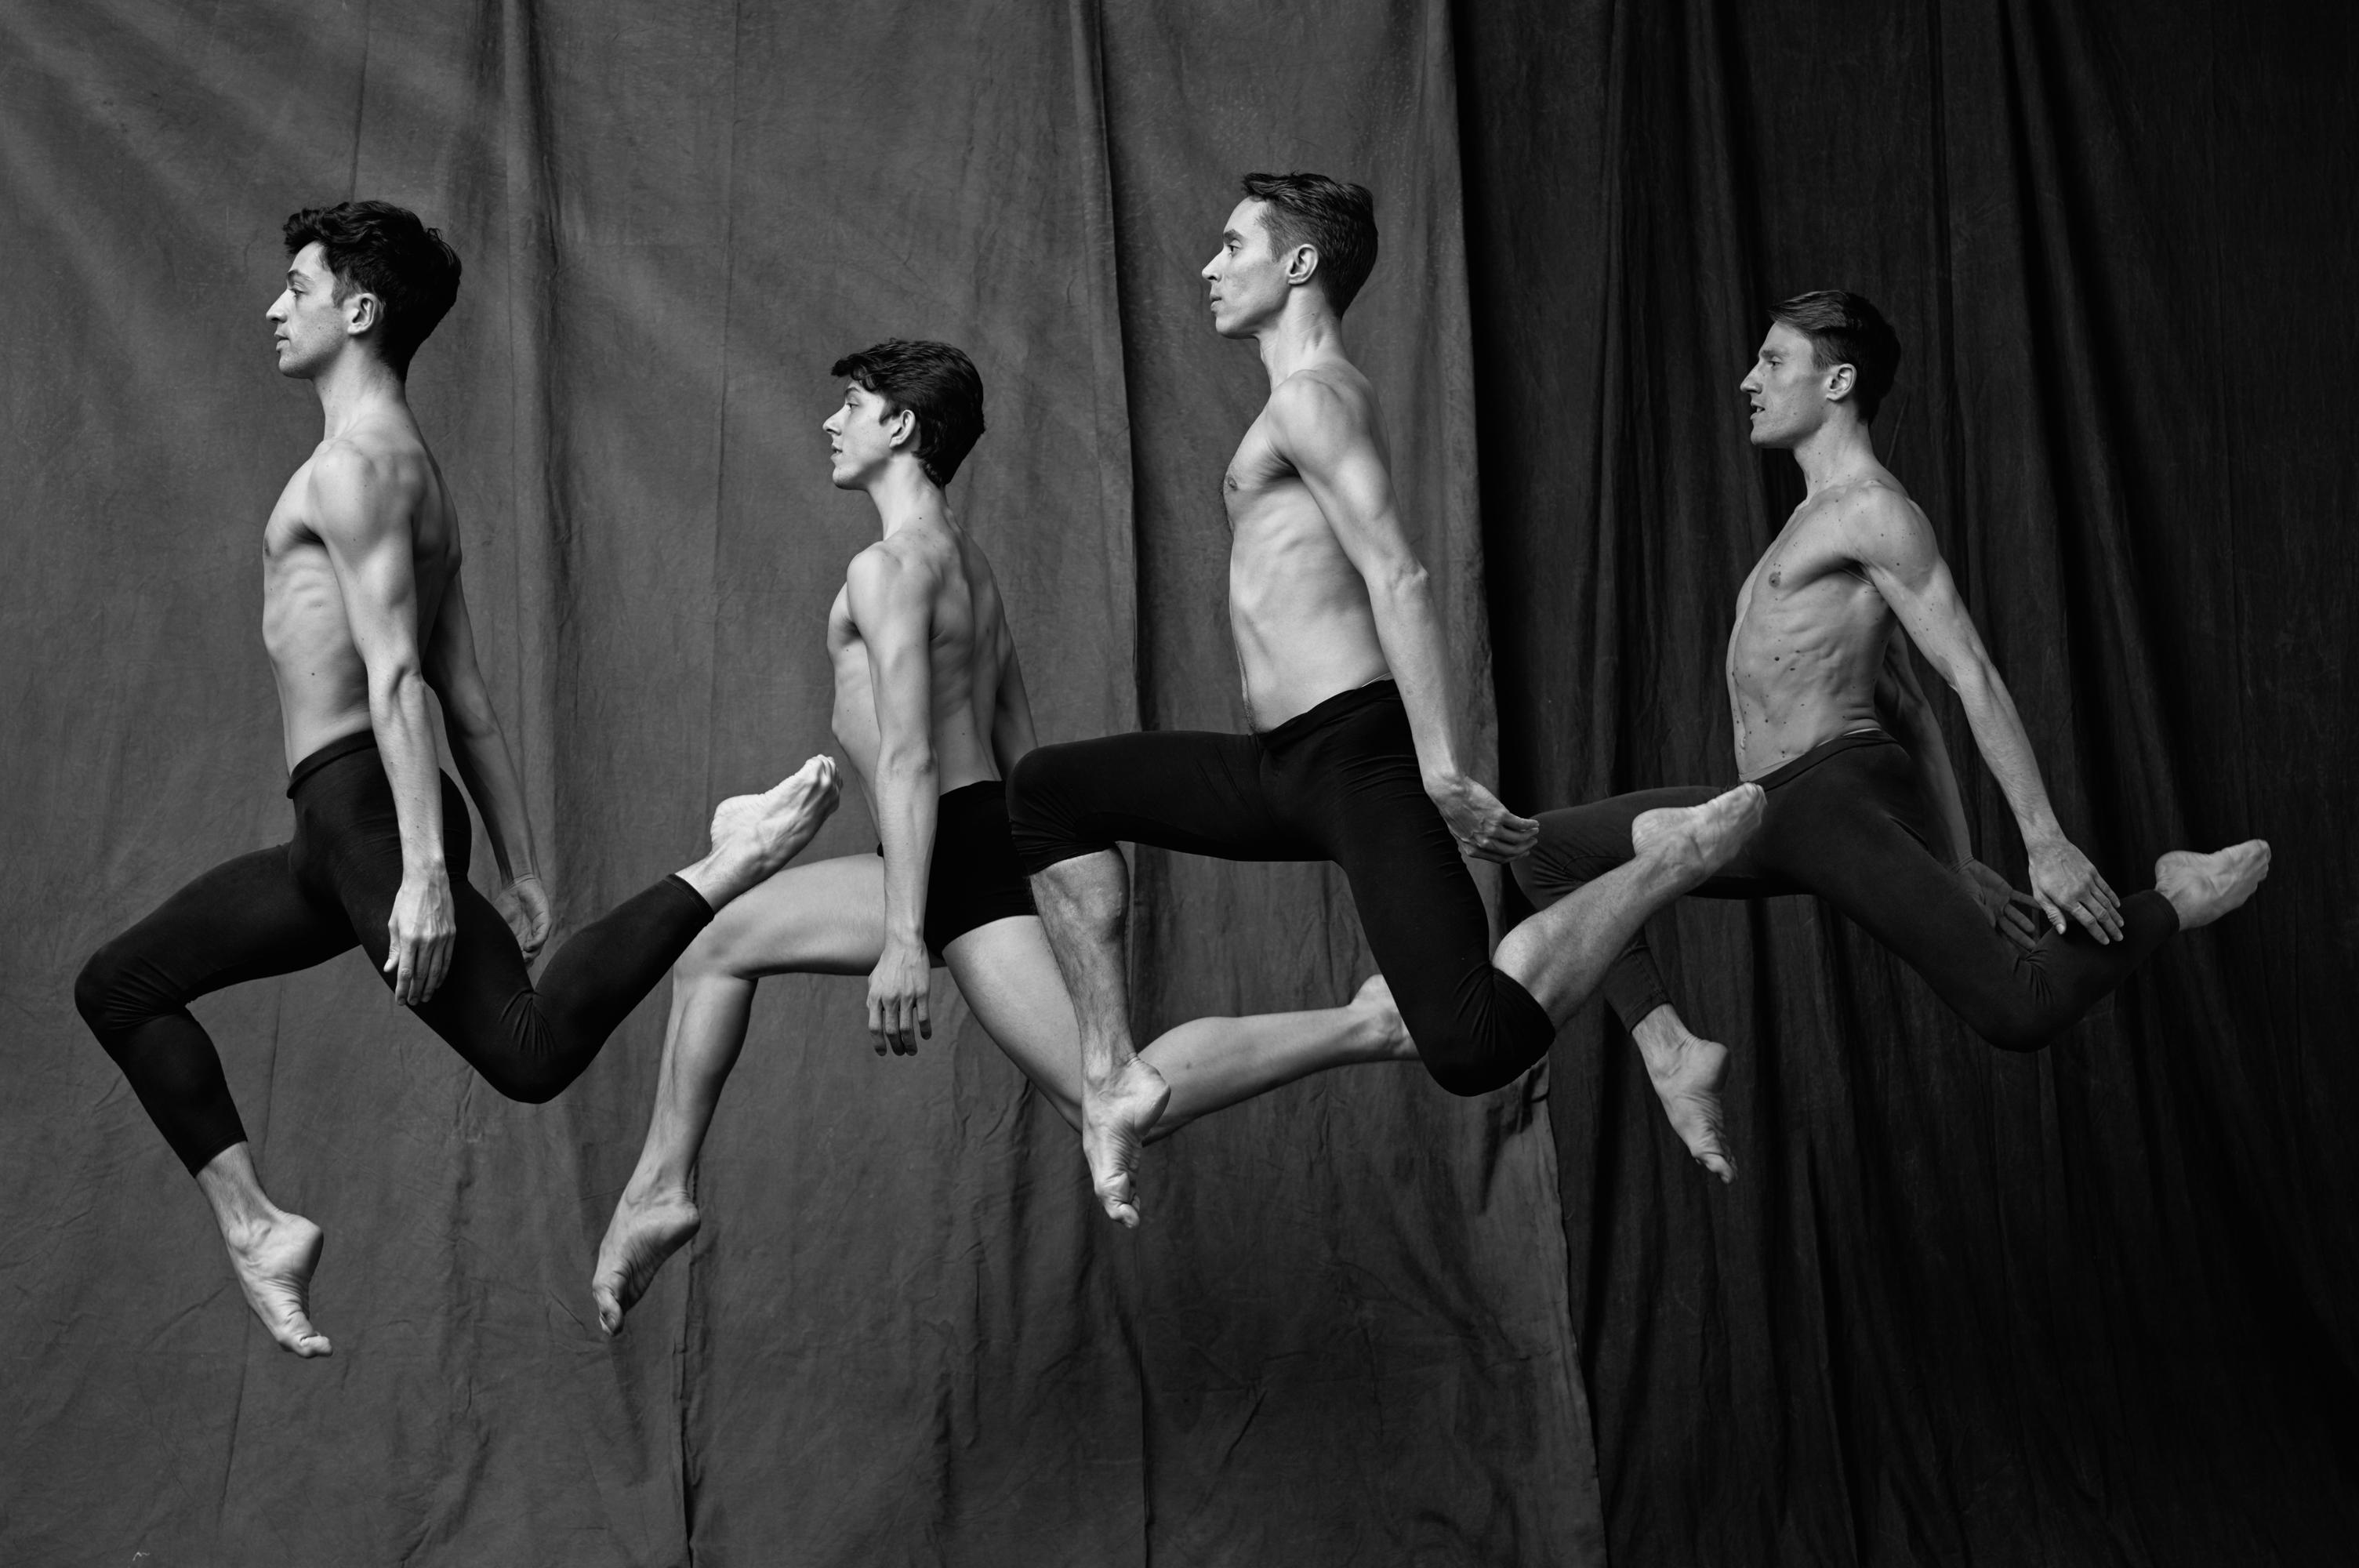 The men of the Paris Opera Ballet